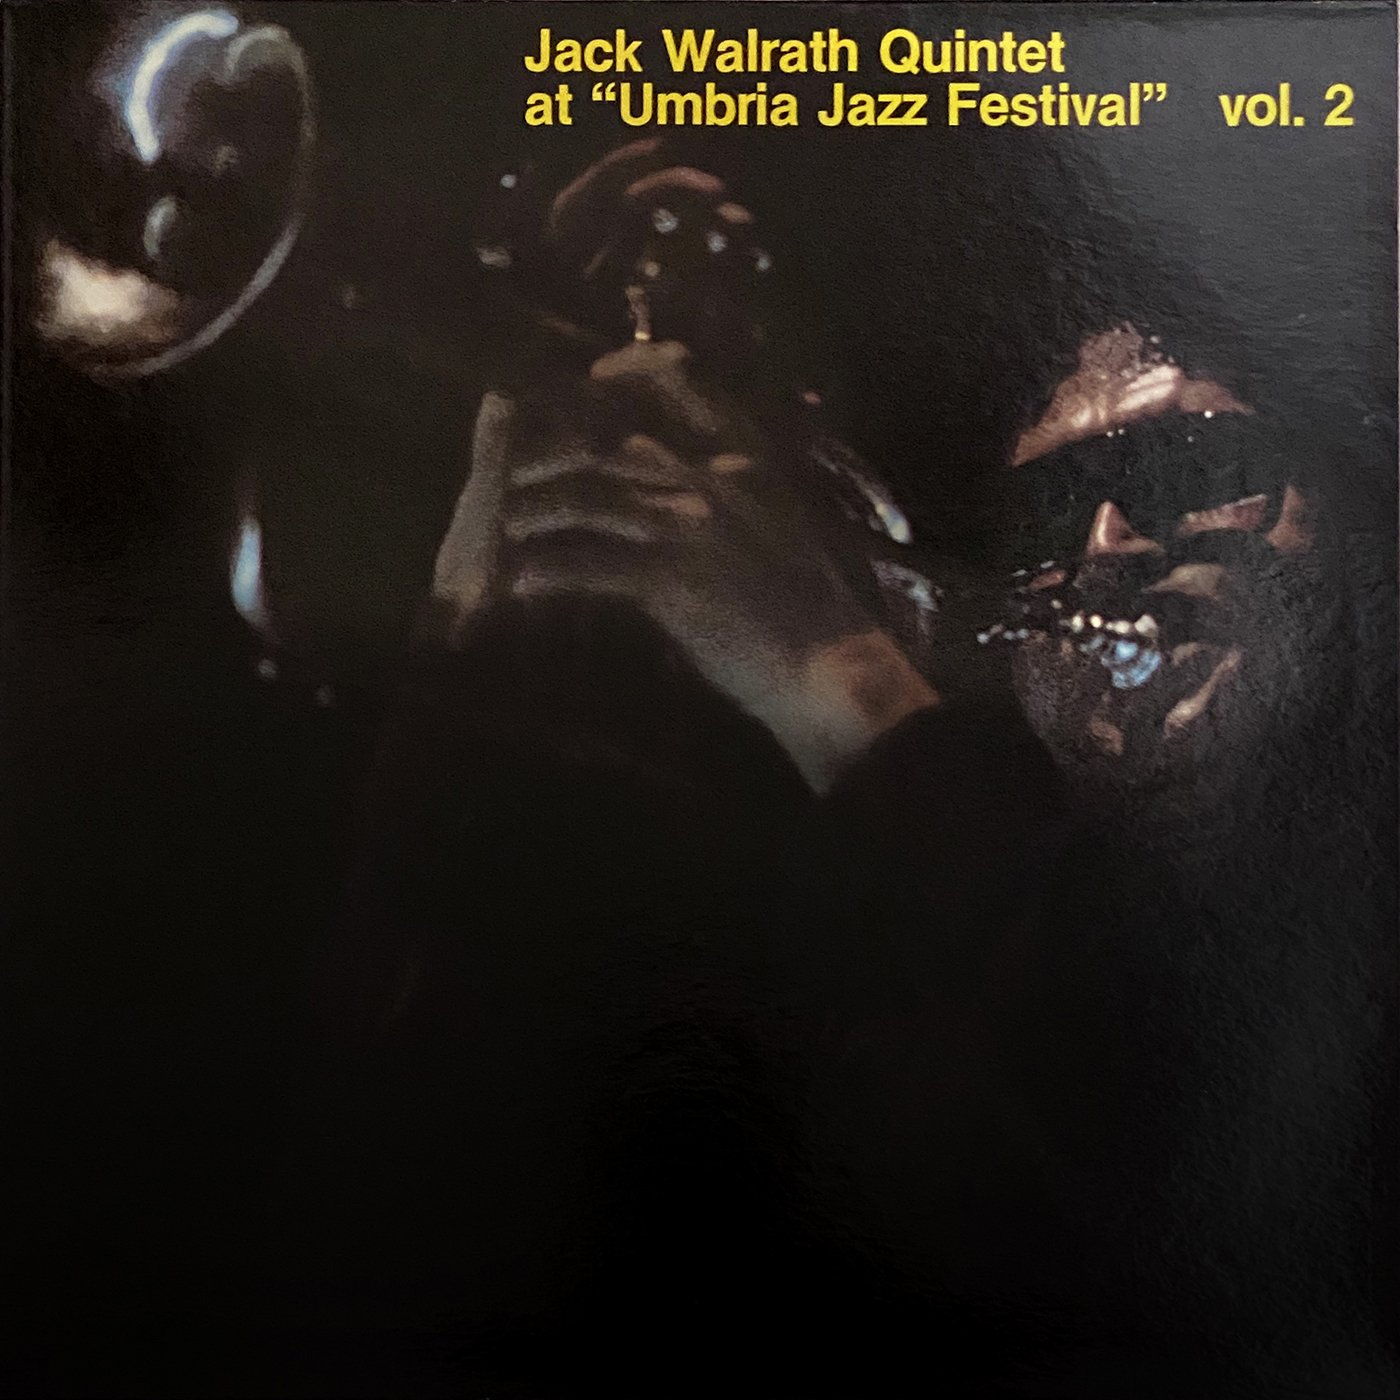 "At ""Umbria Jazz Festival"" Vol.2 - Jack Walrath Quintet"